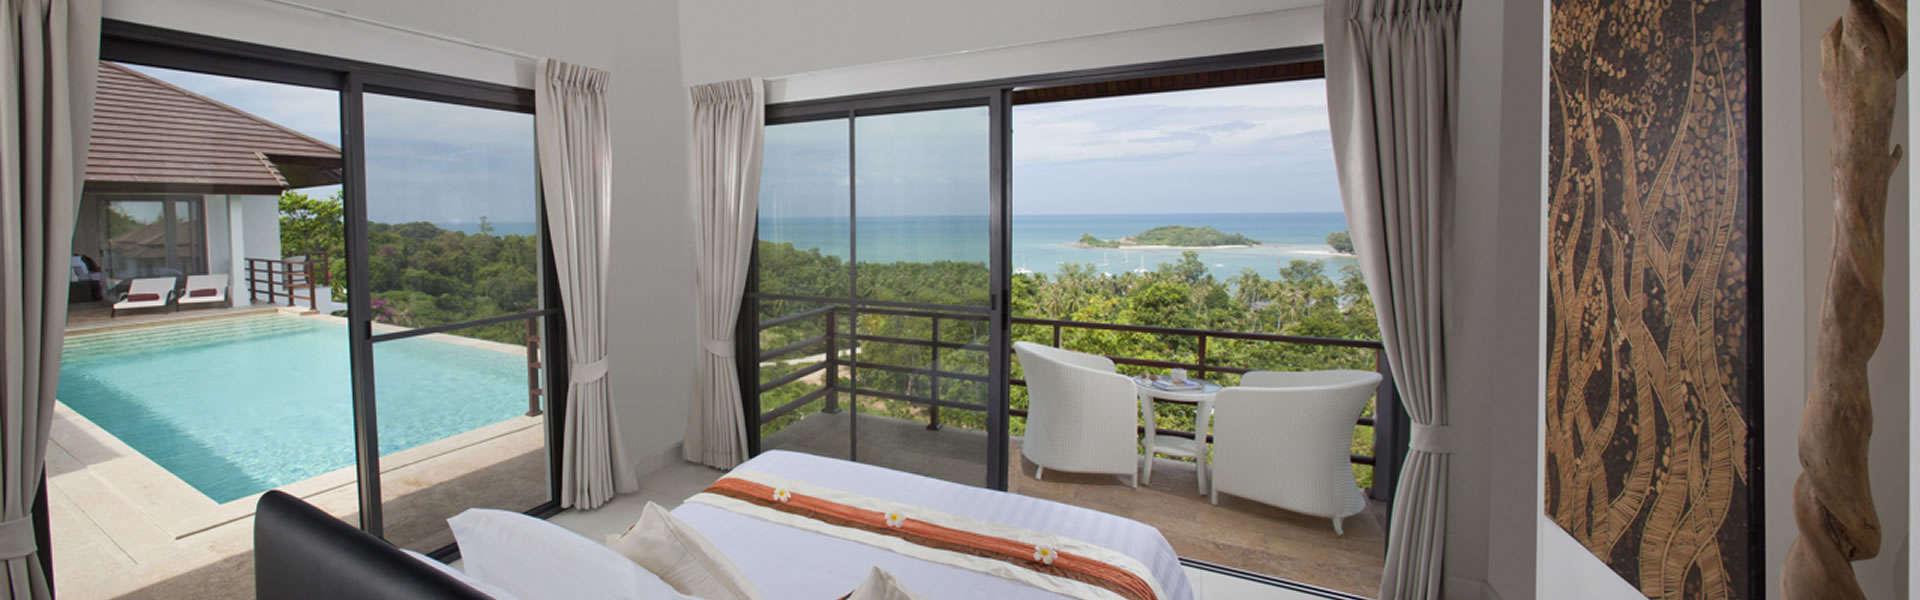 Samui villa with balcony and pool